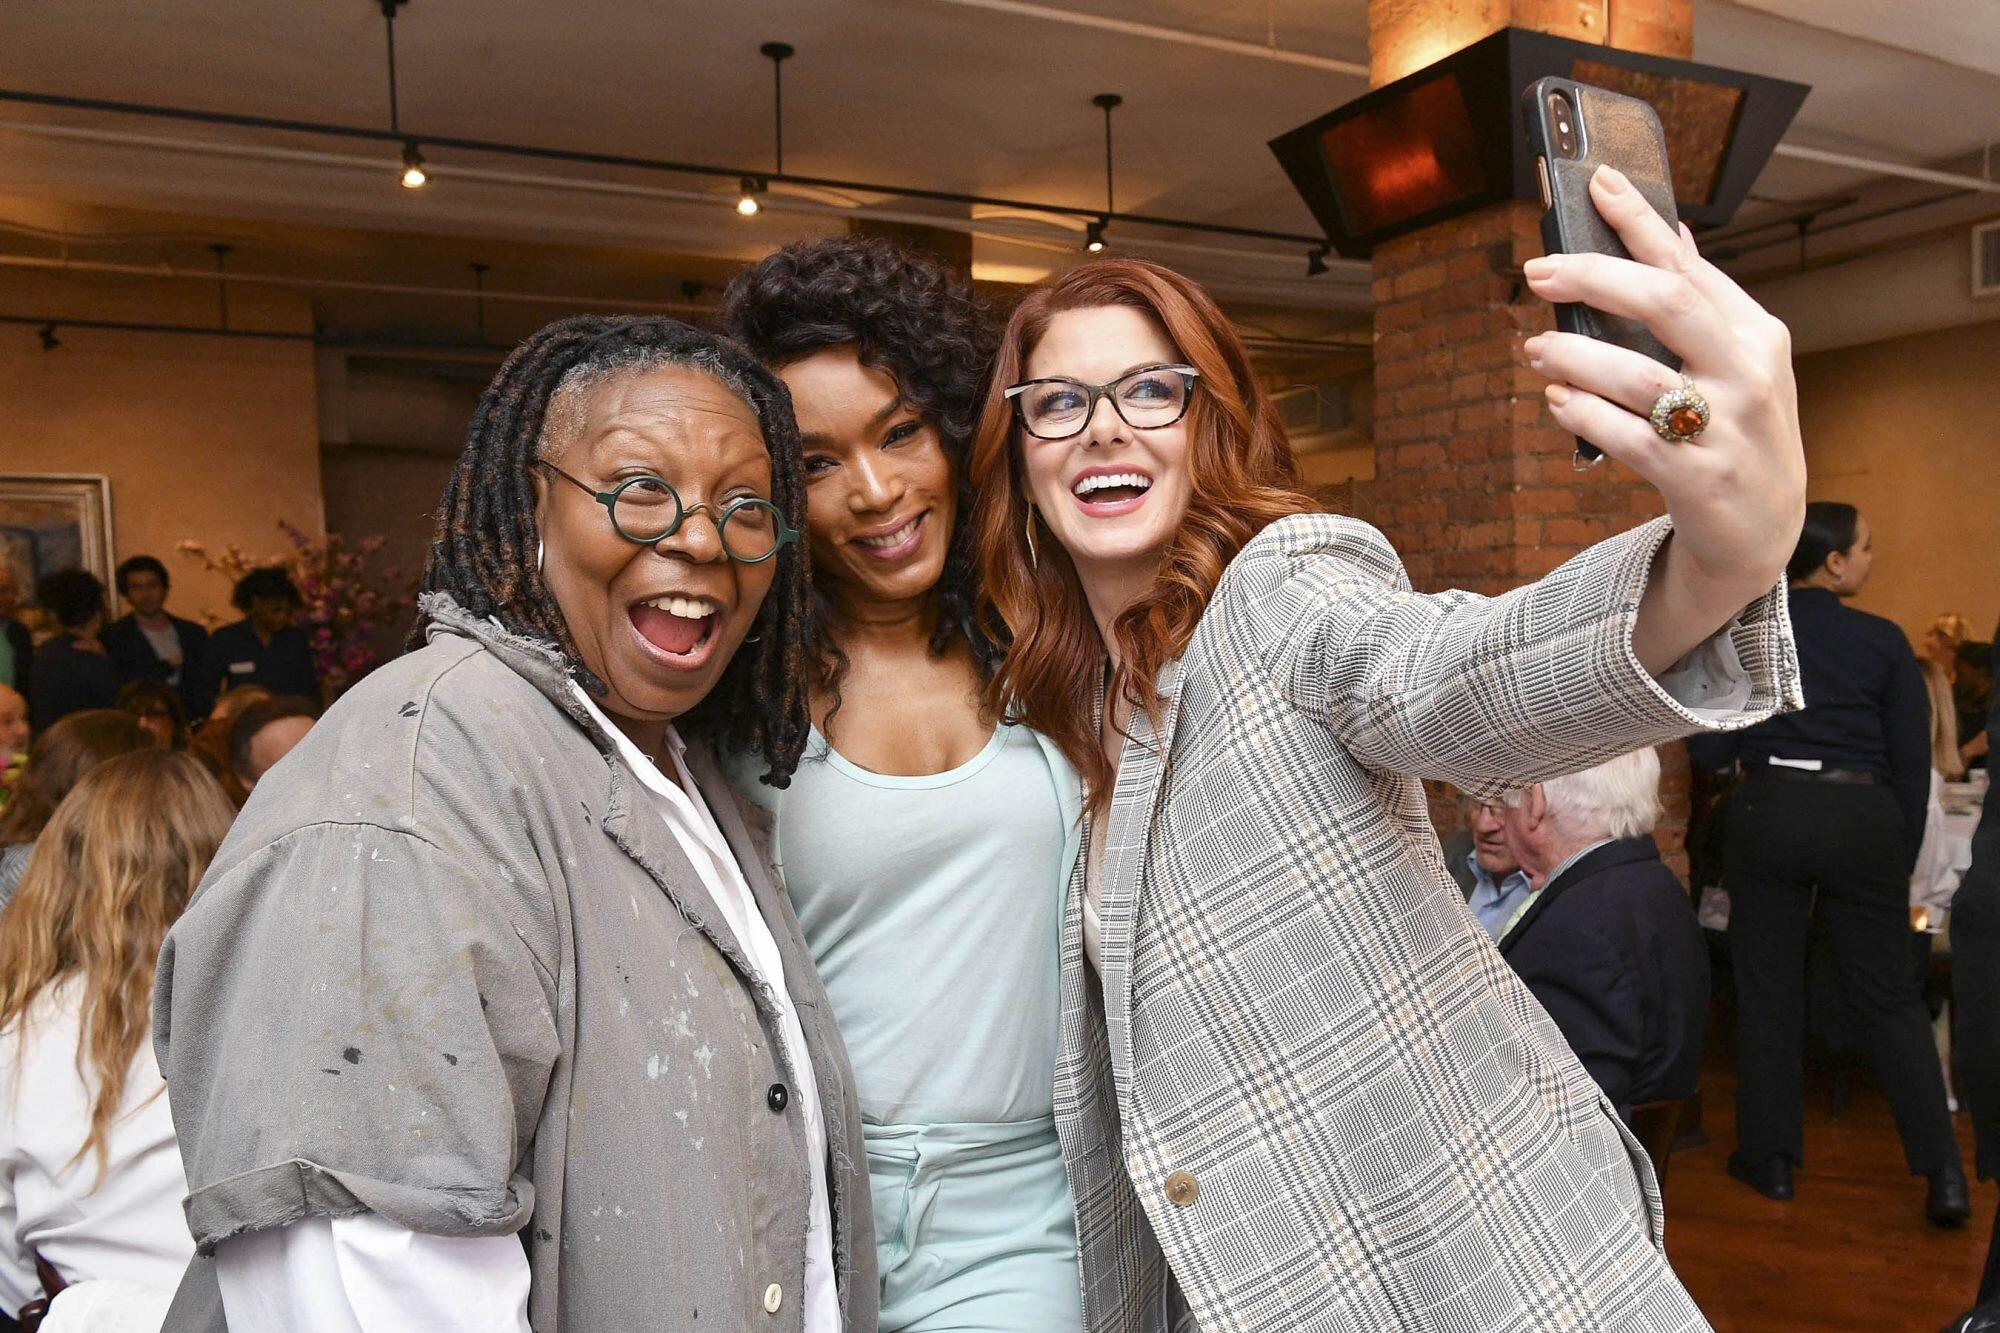 Angela Nicholas Movies see all the stars at the 2019 tribeca film festival | ew